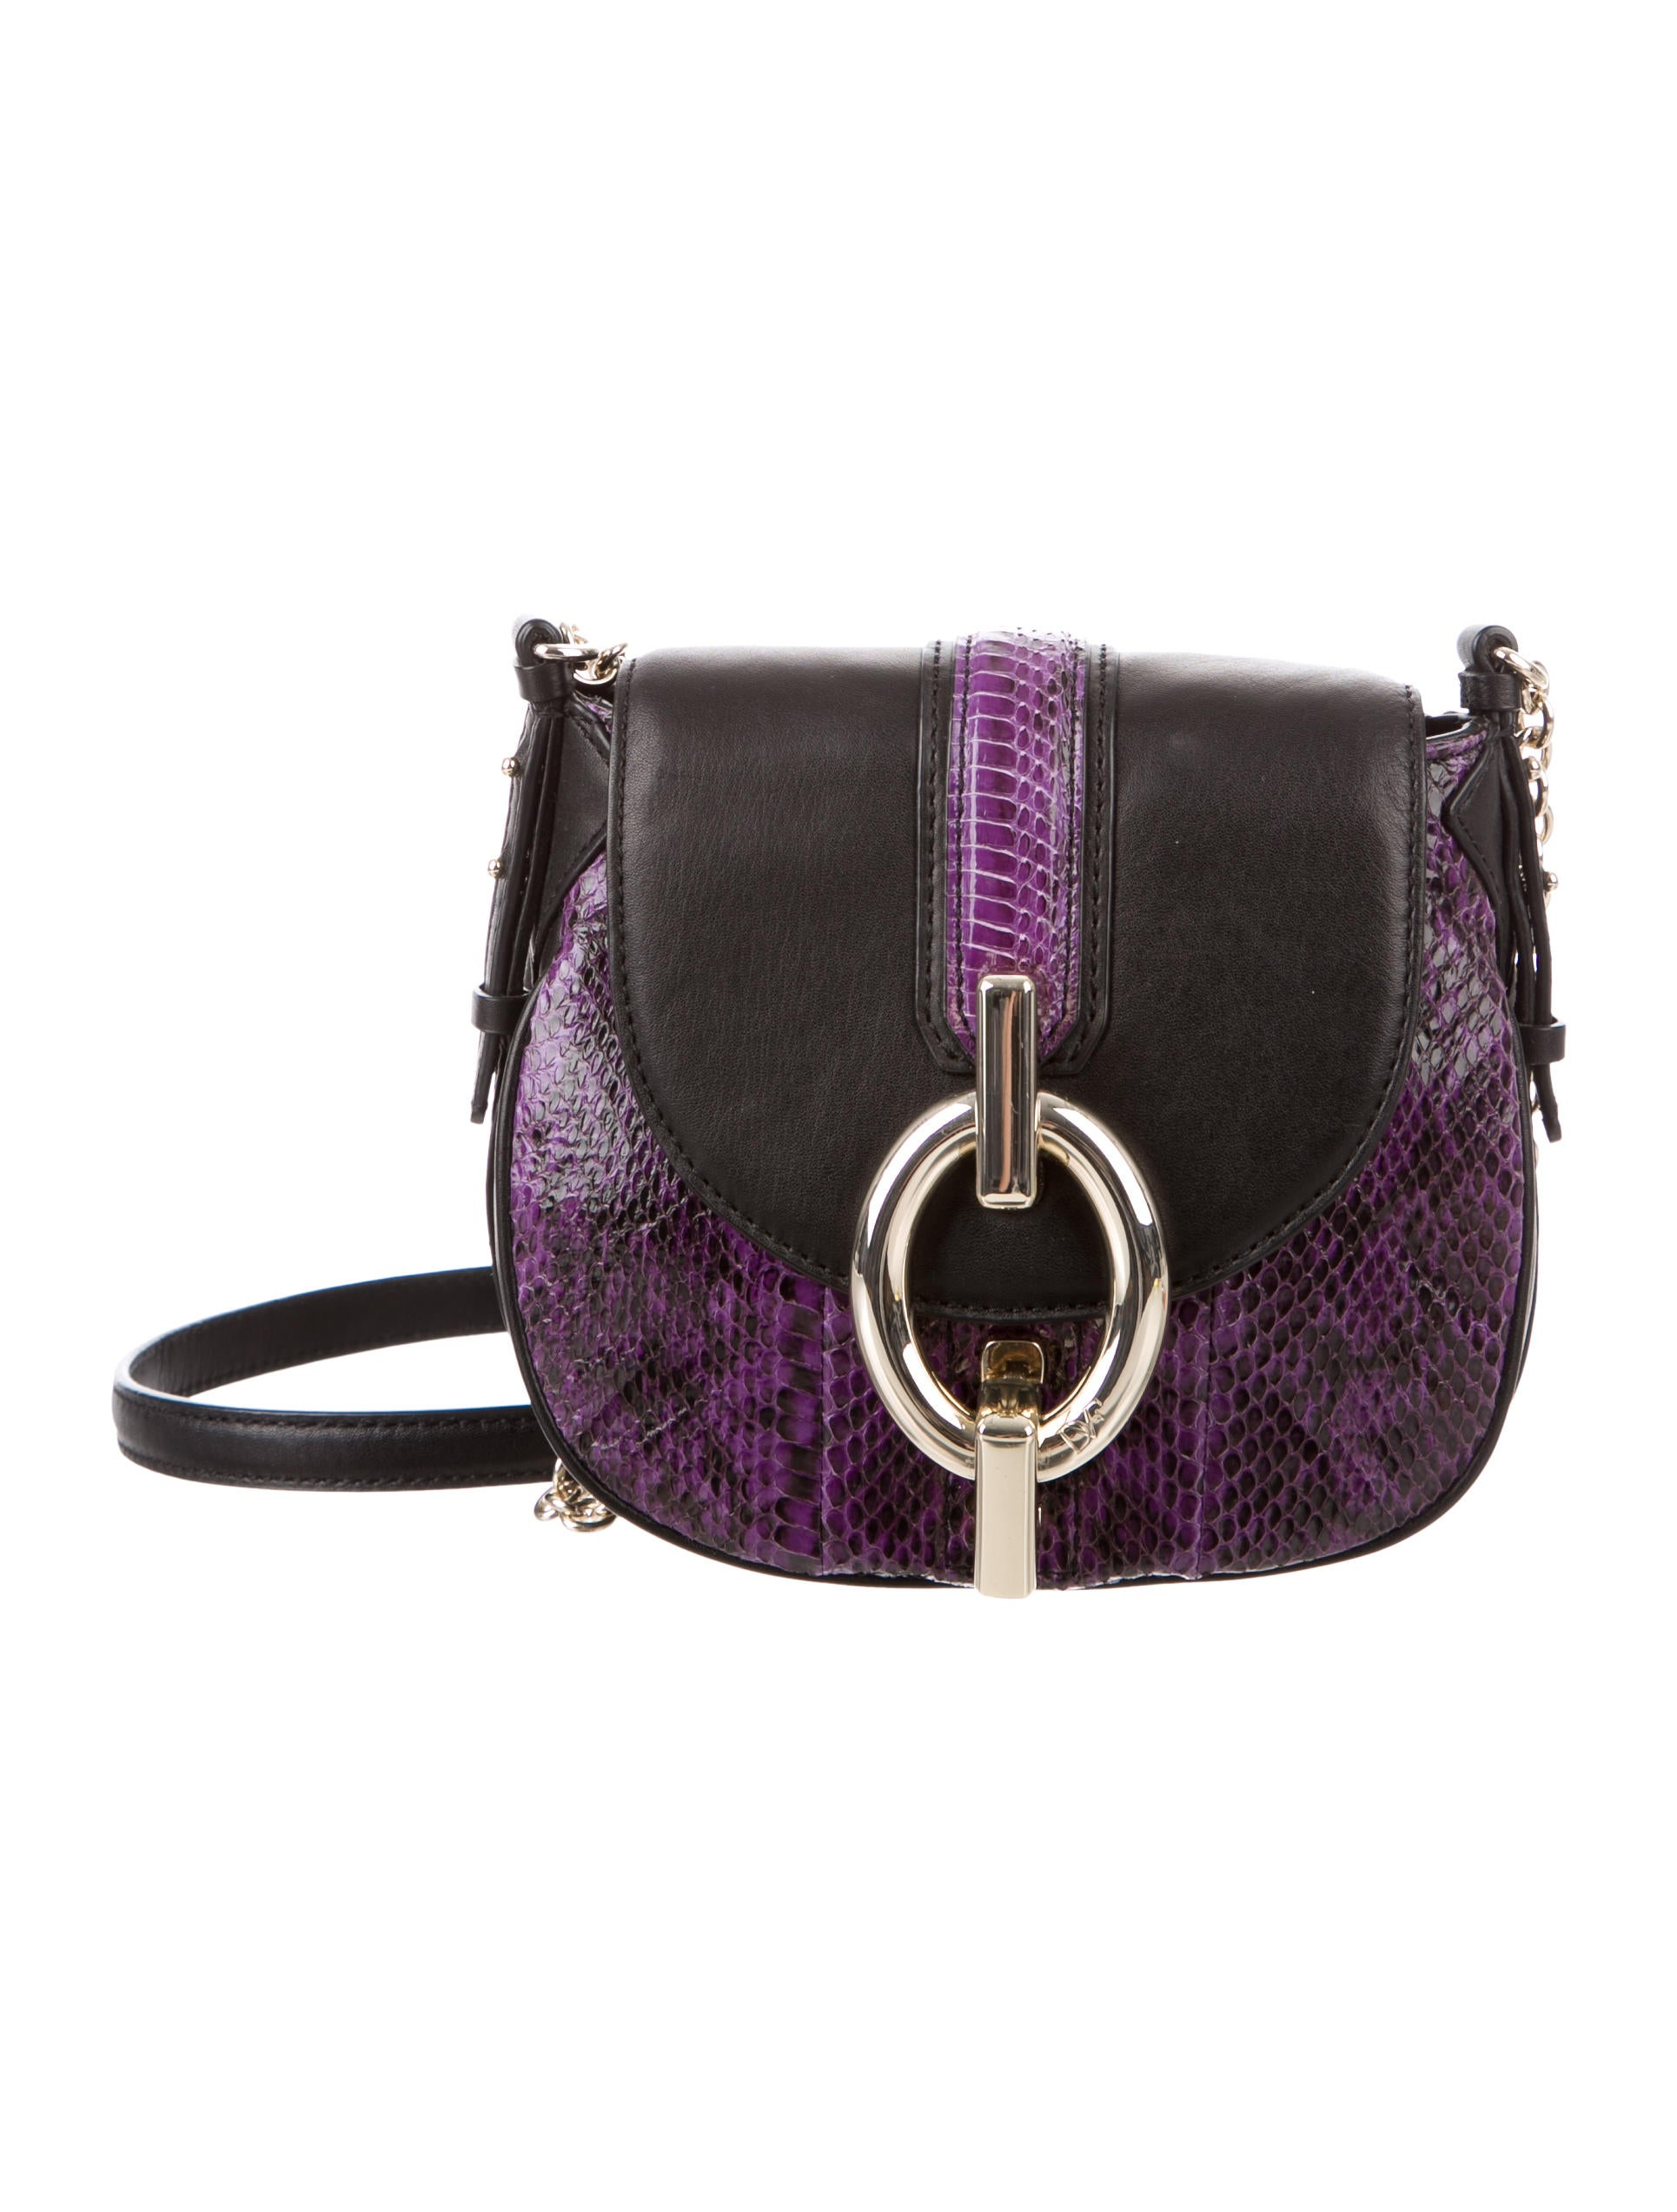 9806f2f7e0ca Diane von Furstenberg Mini Sutra Snakeskin Crossbody - Handbags ...